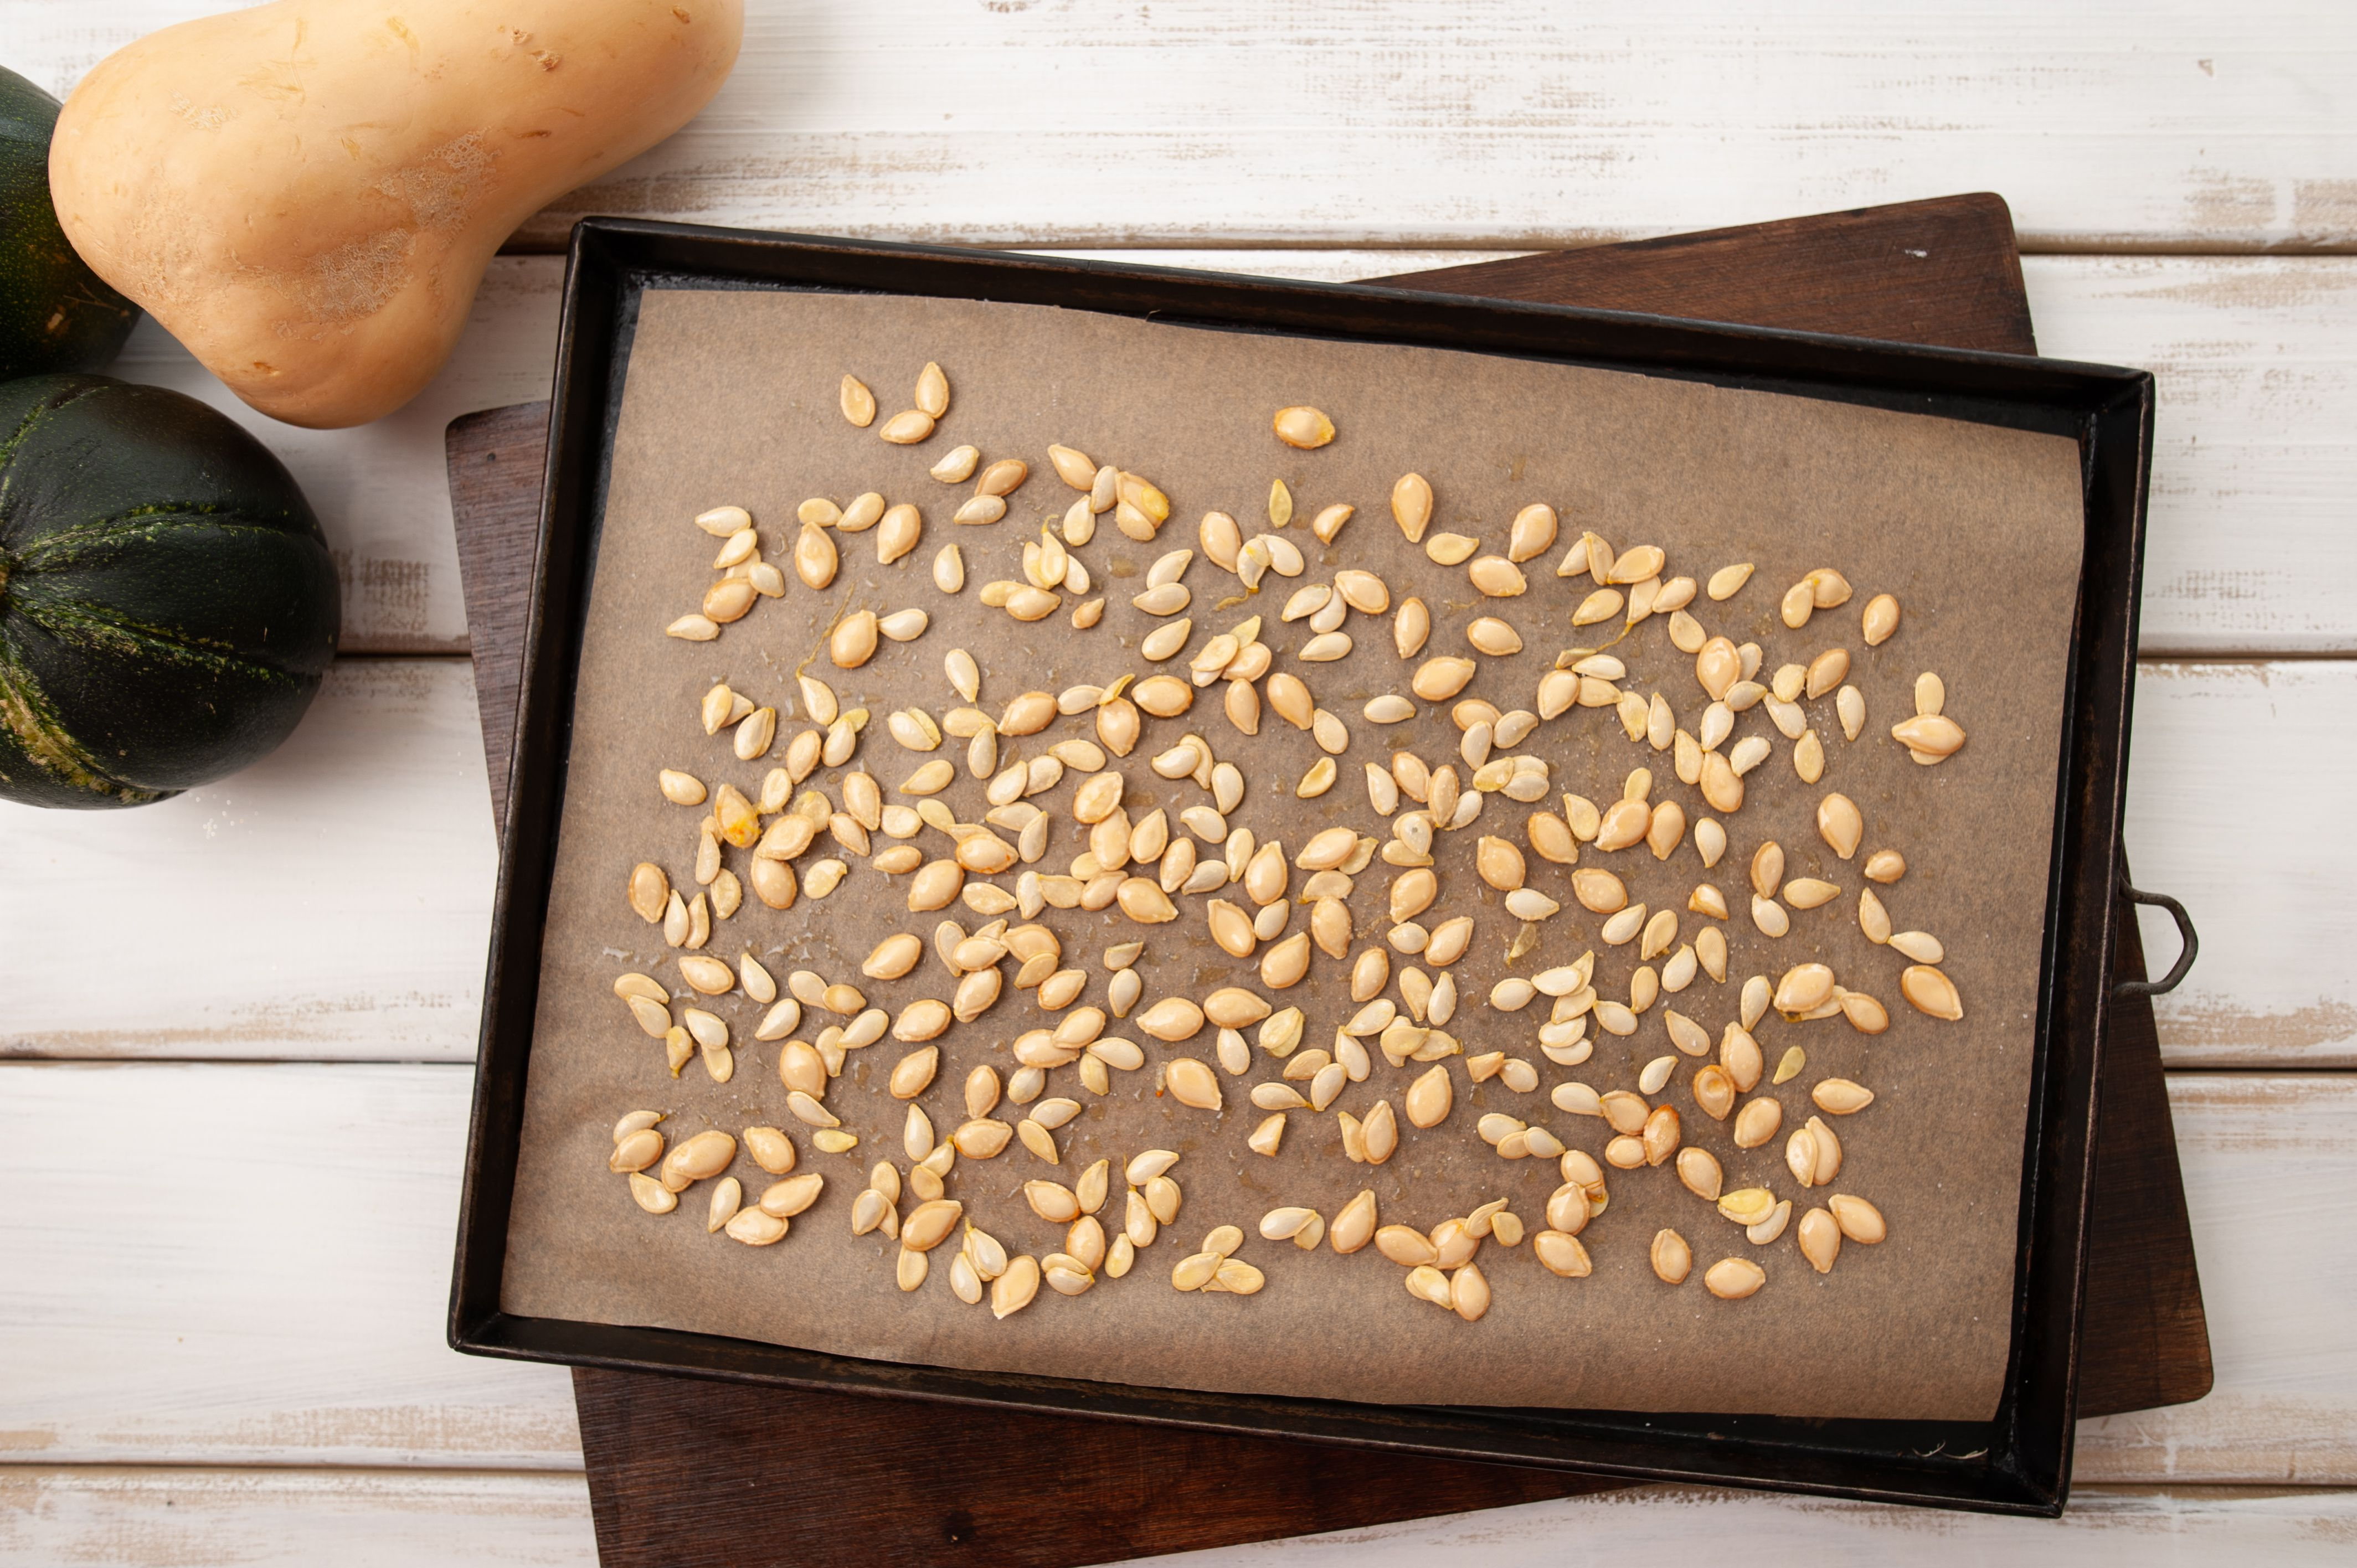 Seeds on a baking sheet